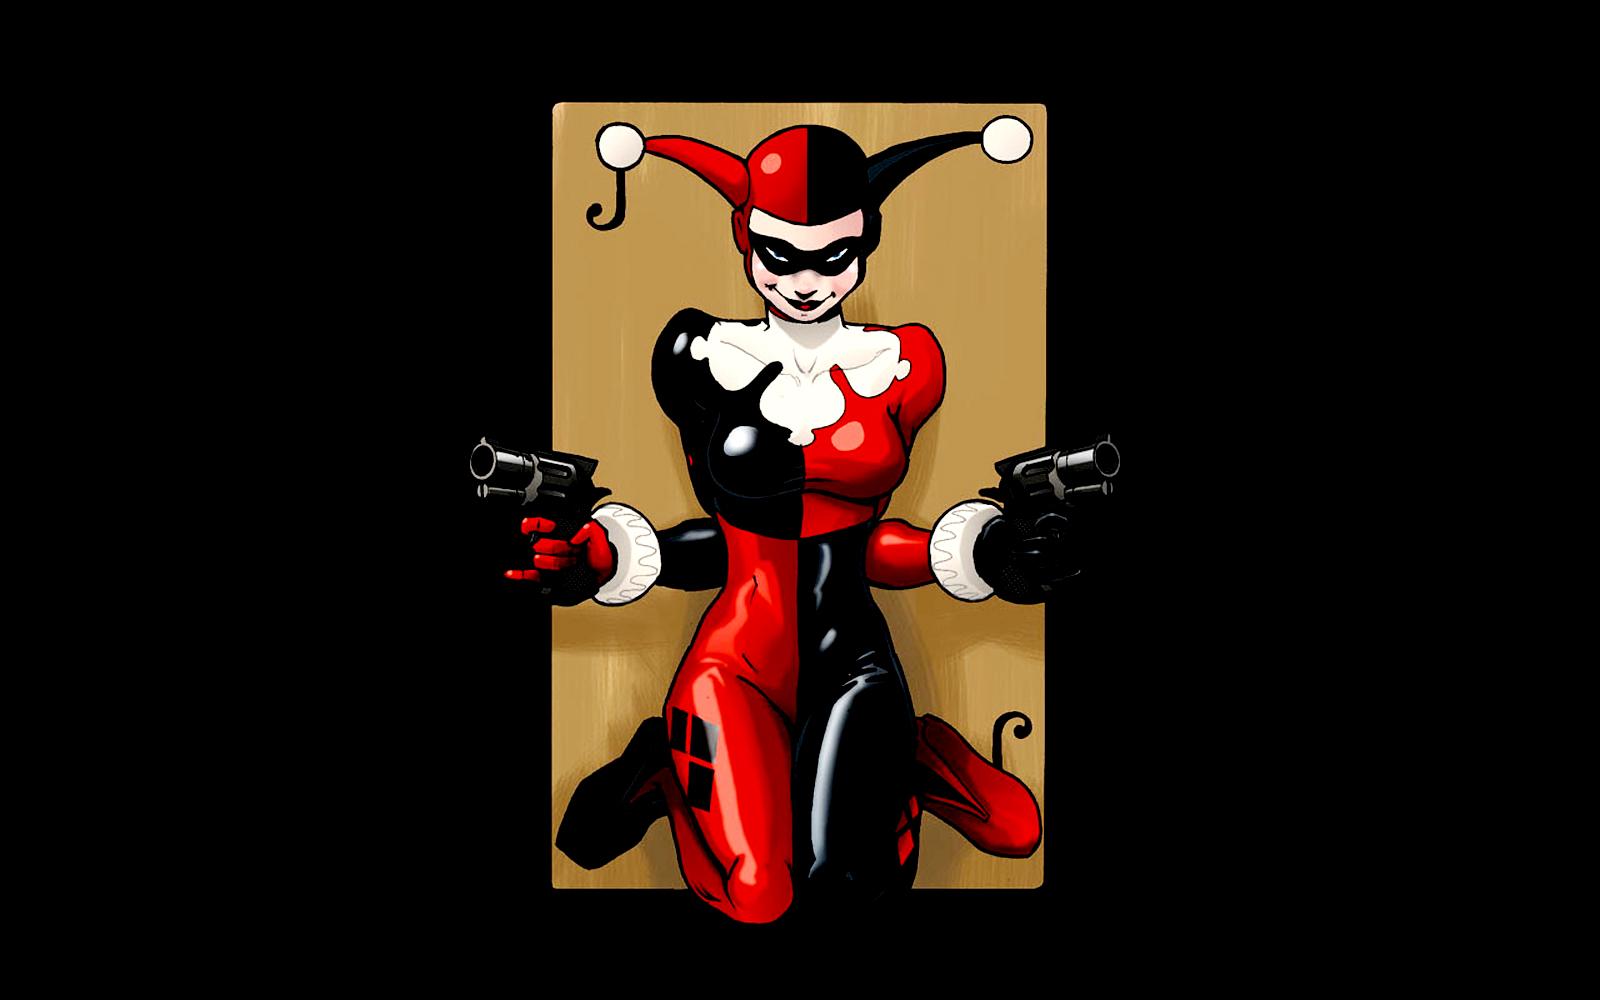 Free download Images Joker And Harley Quinn Wallpaper ...